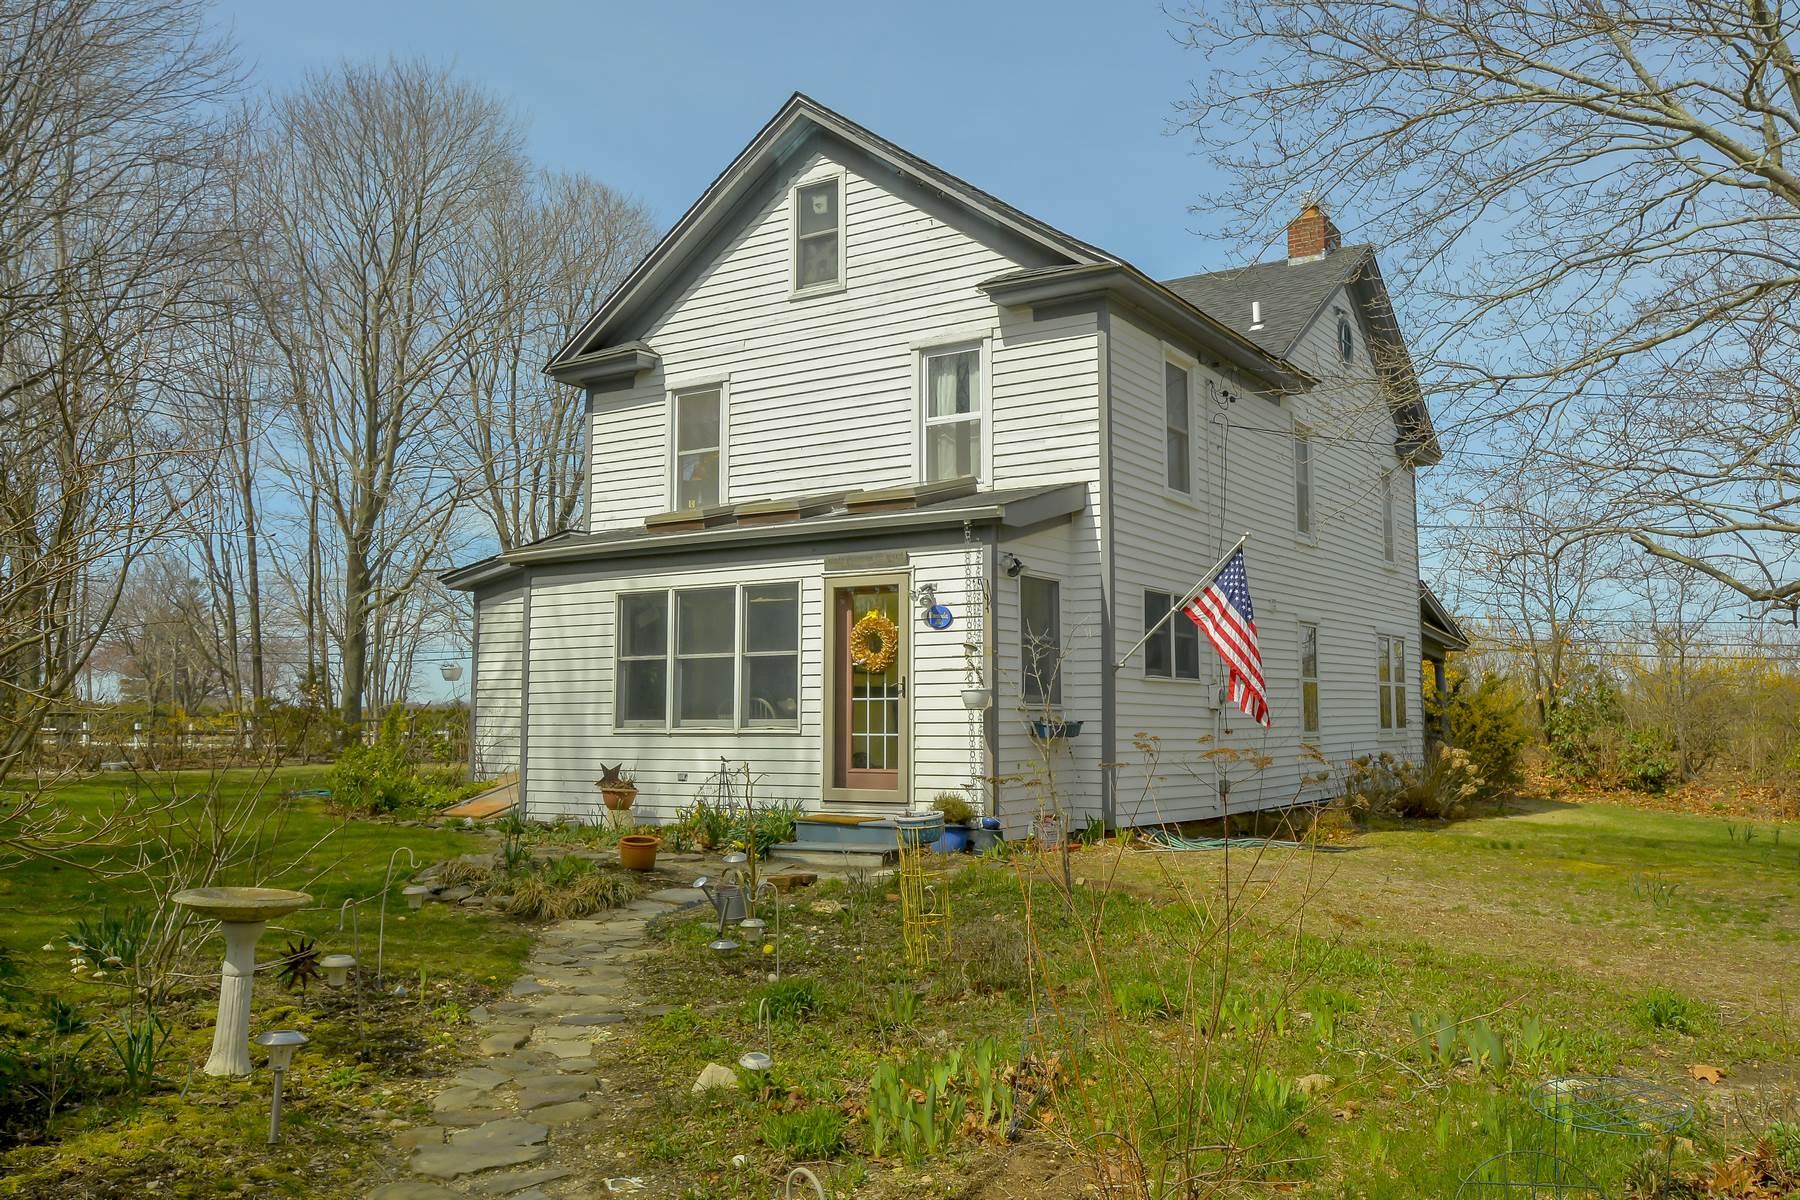 獨棟家庭住宅 為 出售 在 Antique/Hist 600 Main Rd Laurel, 紐約州, 11948 美國